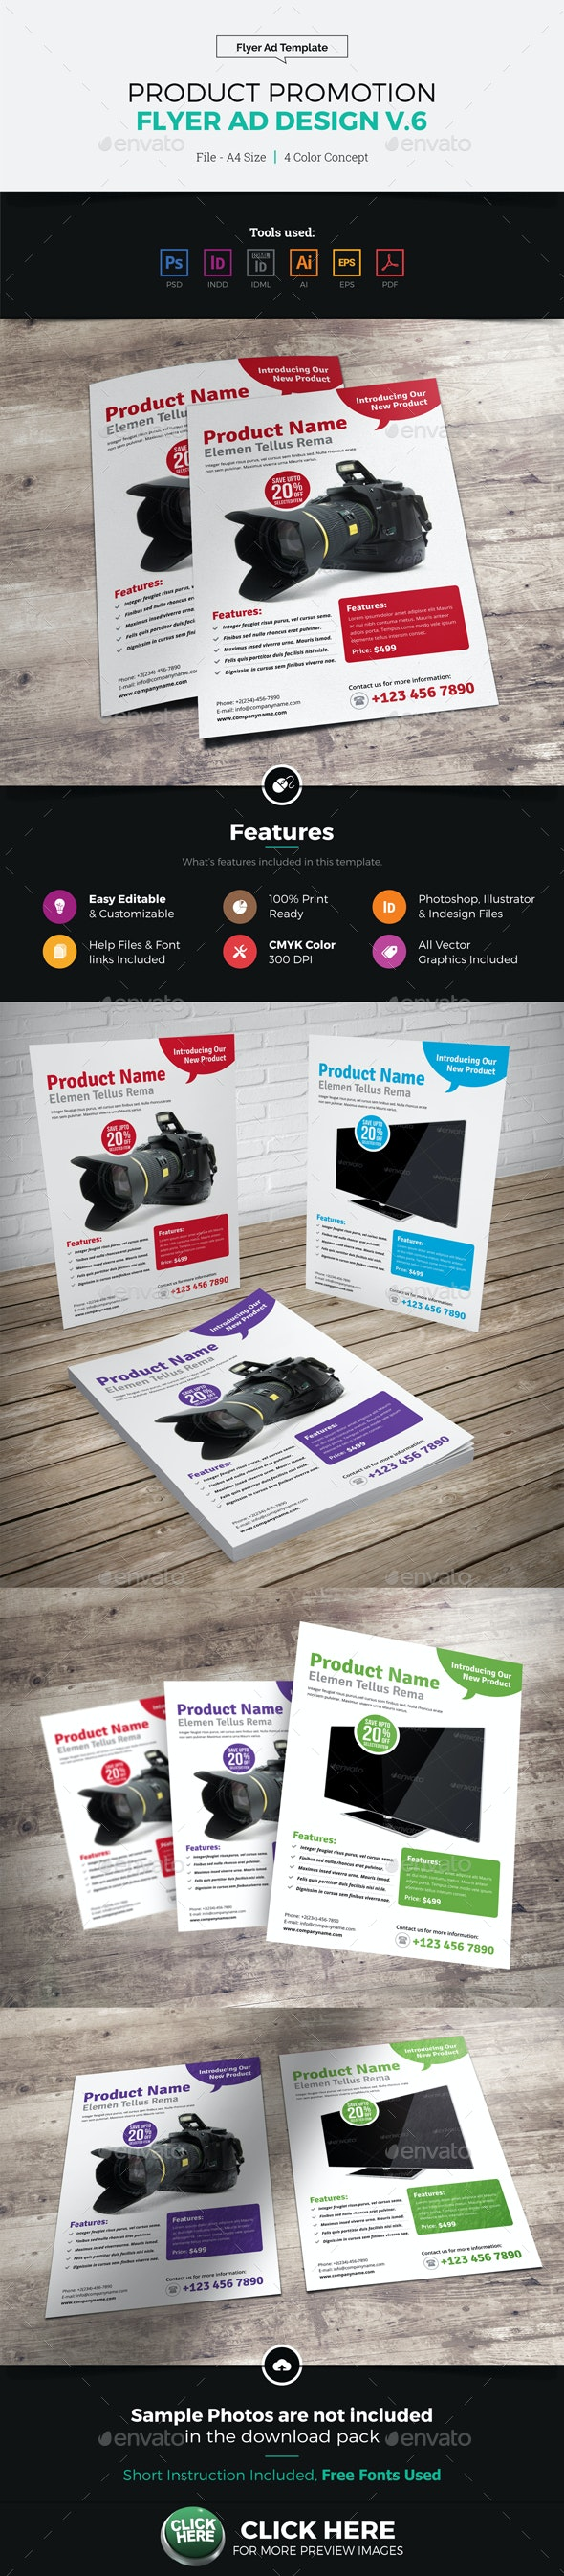 Product Sale Promotion Flyer Ad Design v6 - Corporate Flyers